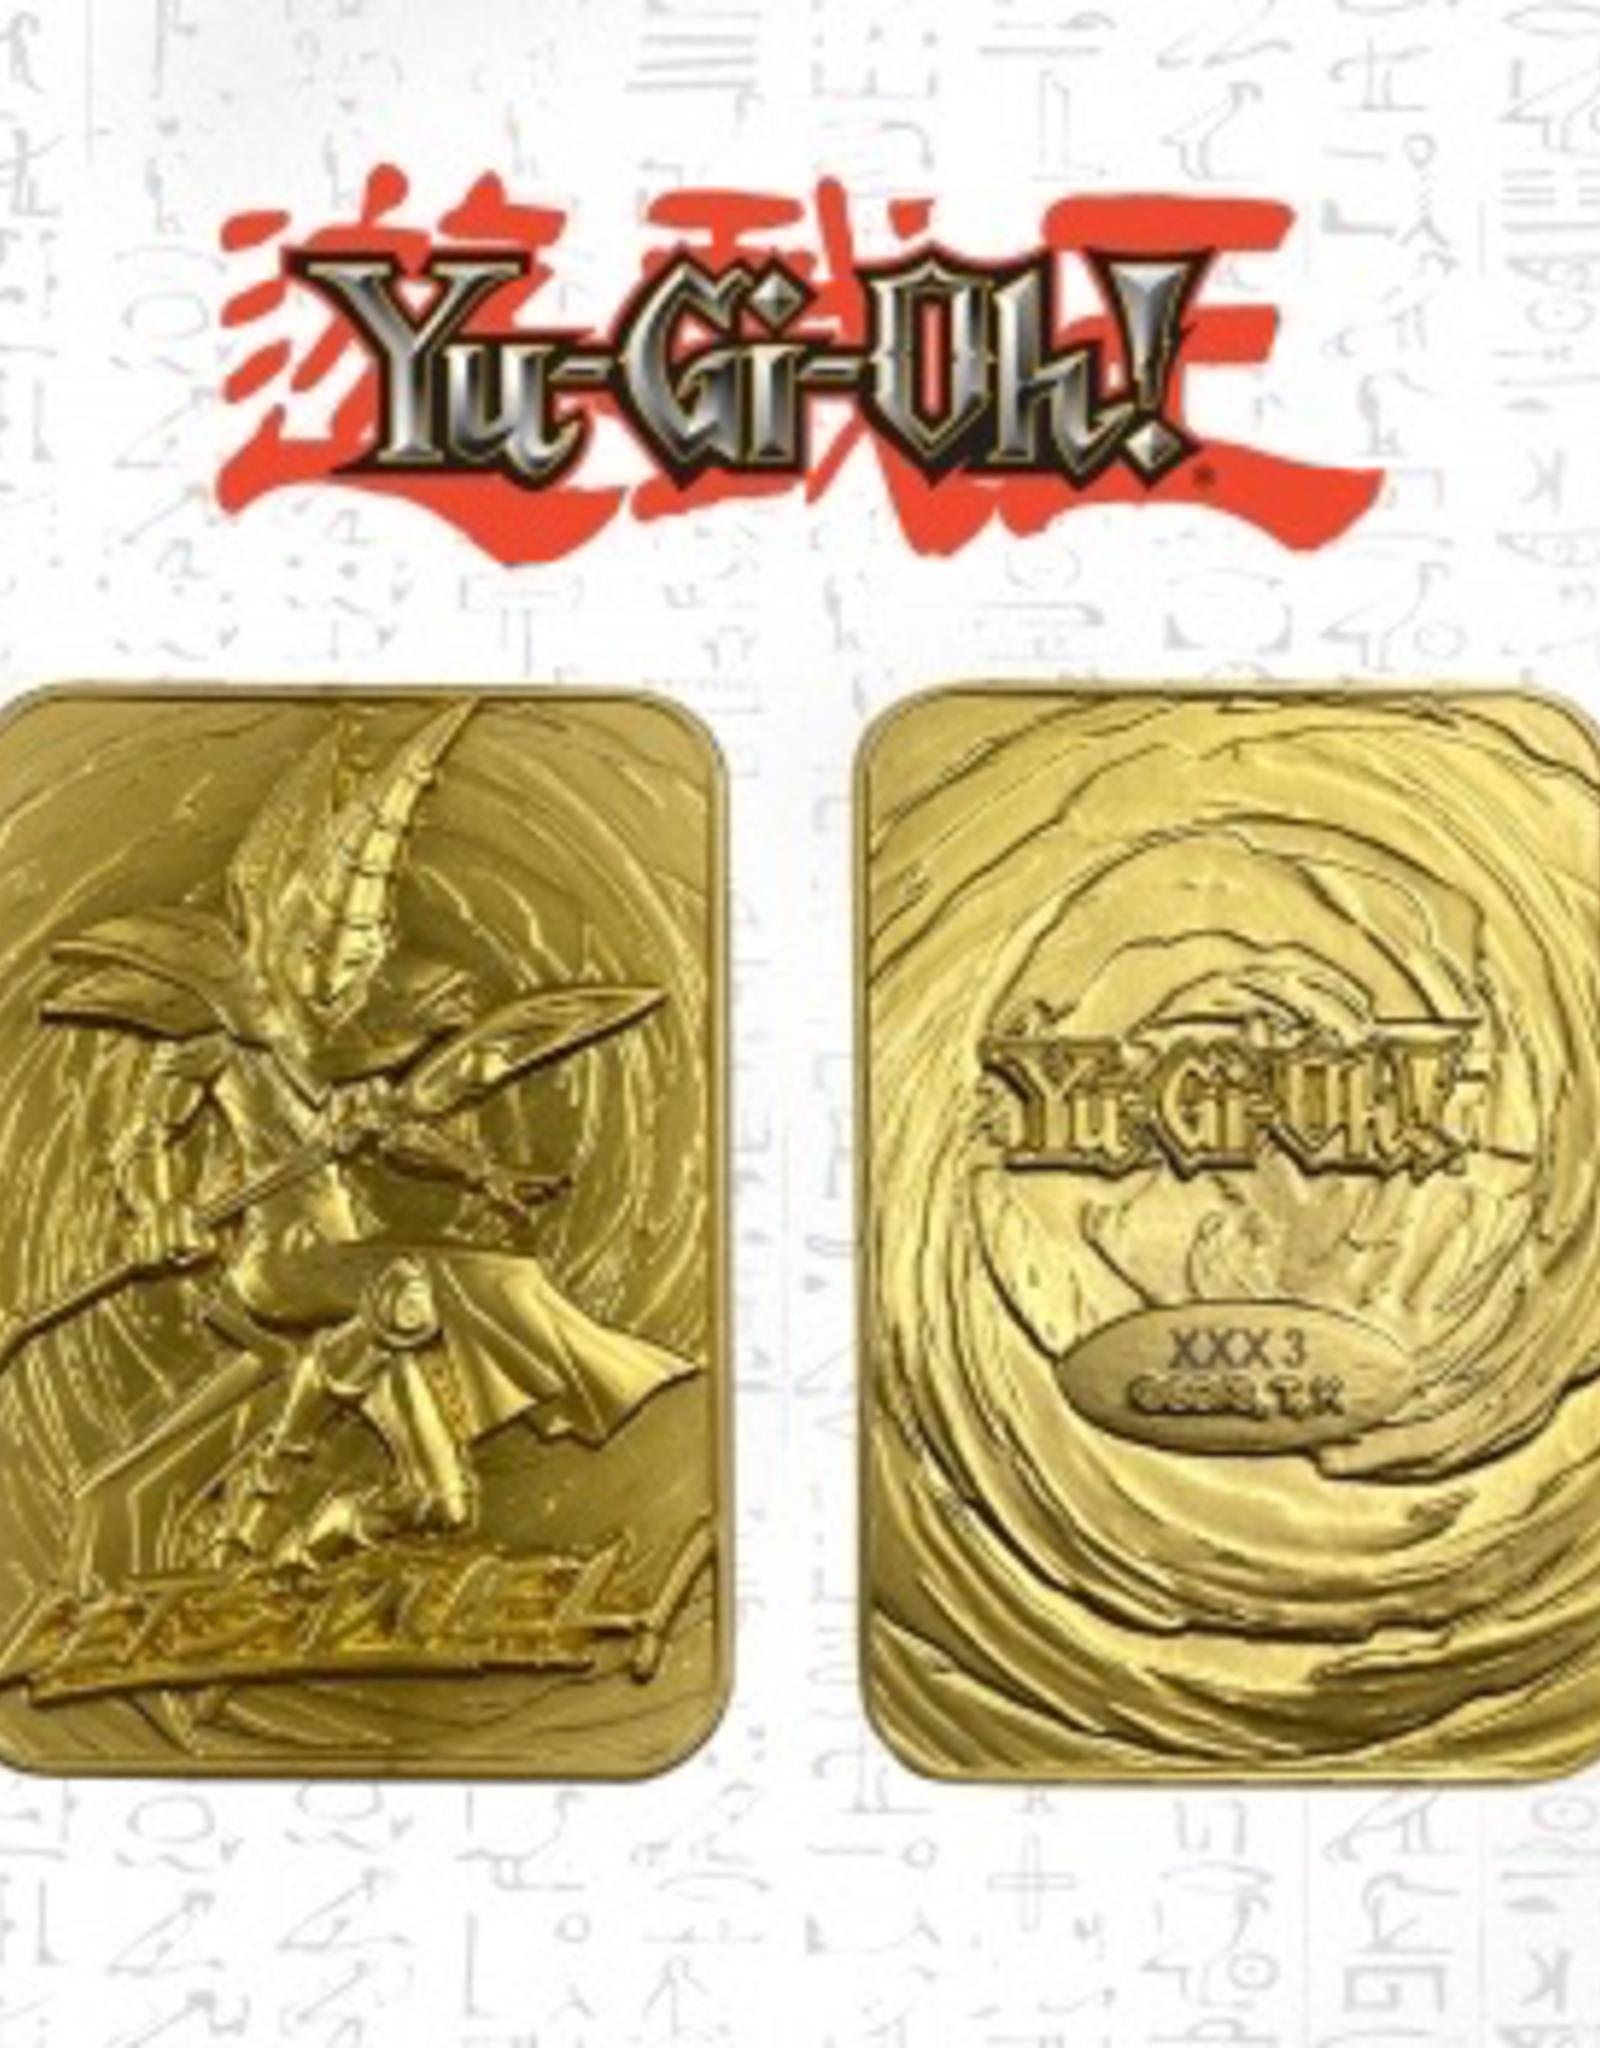 YGO - Zubehör Yu-Gi-Oh! Limited Edition Gold Card Collectibles - Dark Magician